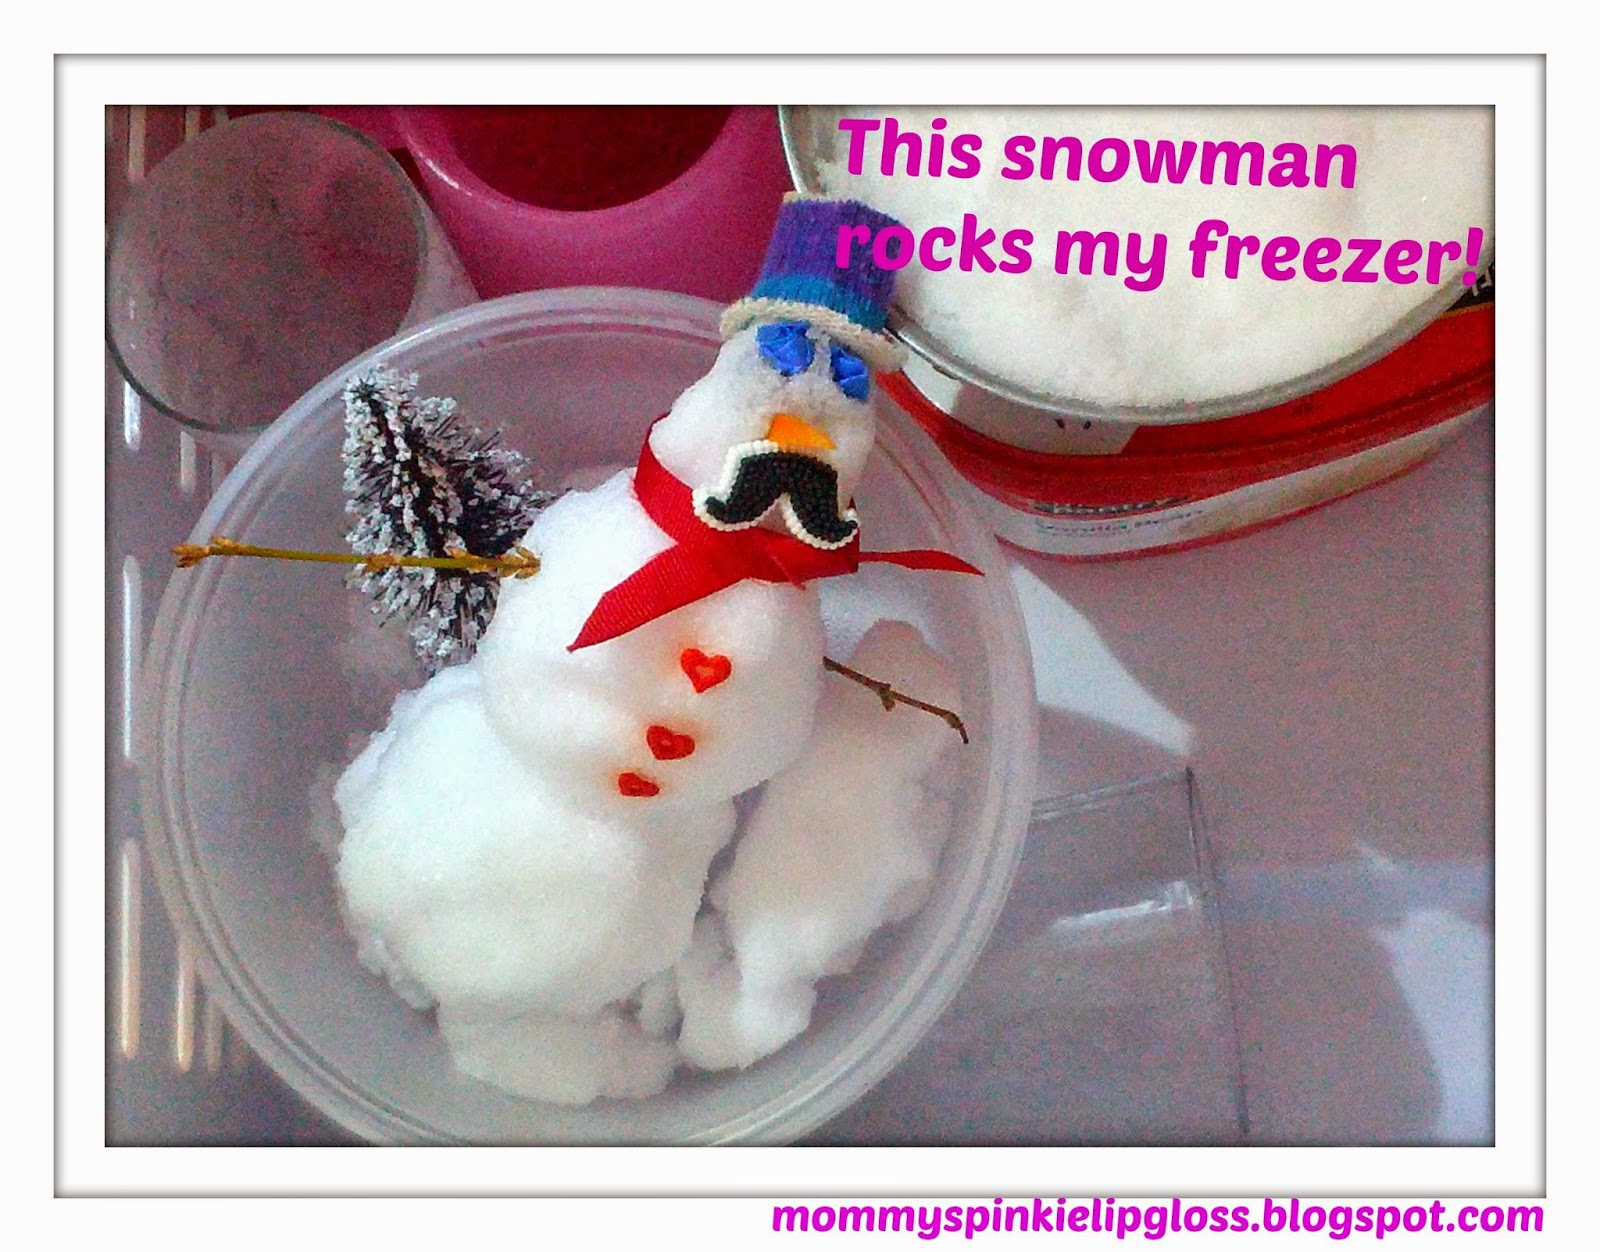 snowman in my freezer from MommysPinkieLipgloss.blogspot.com